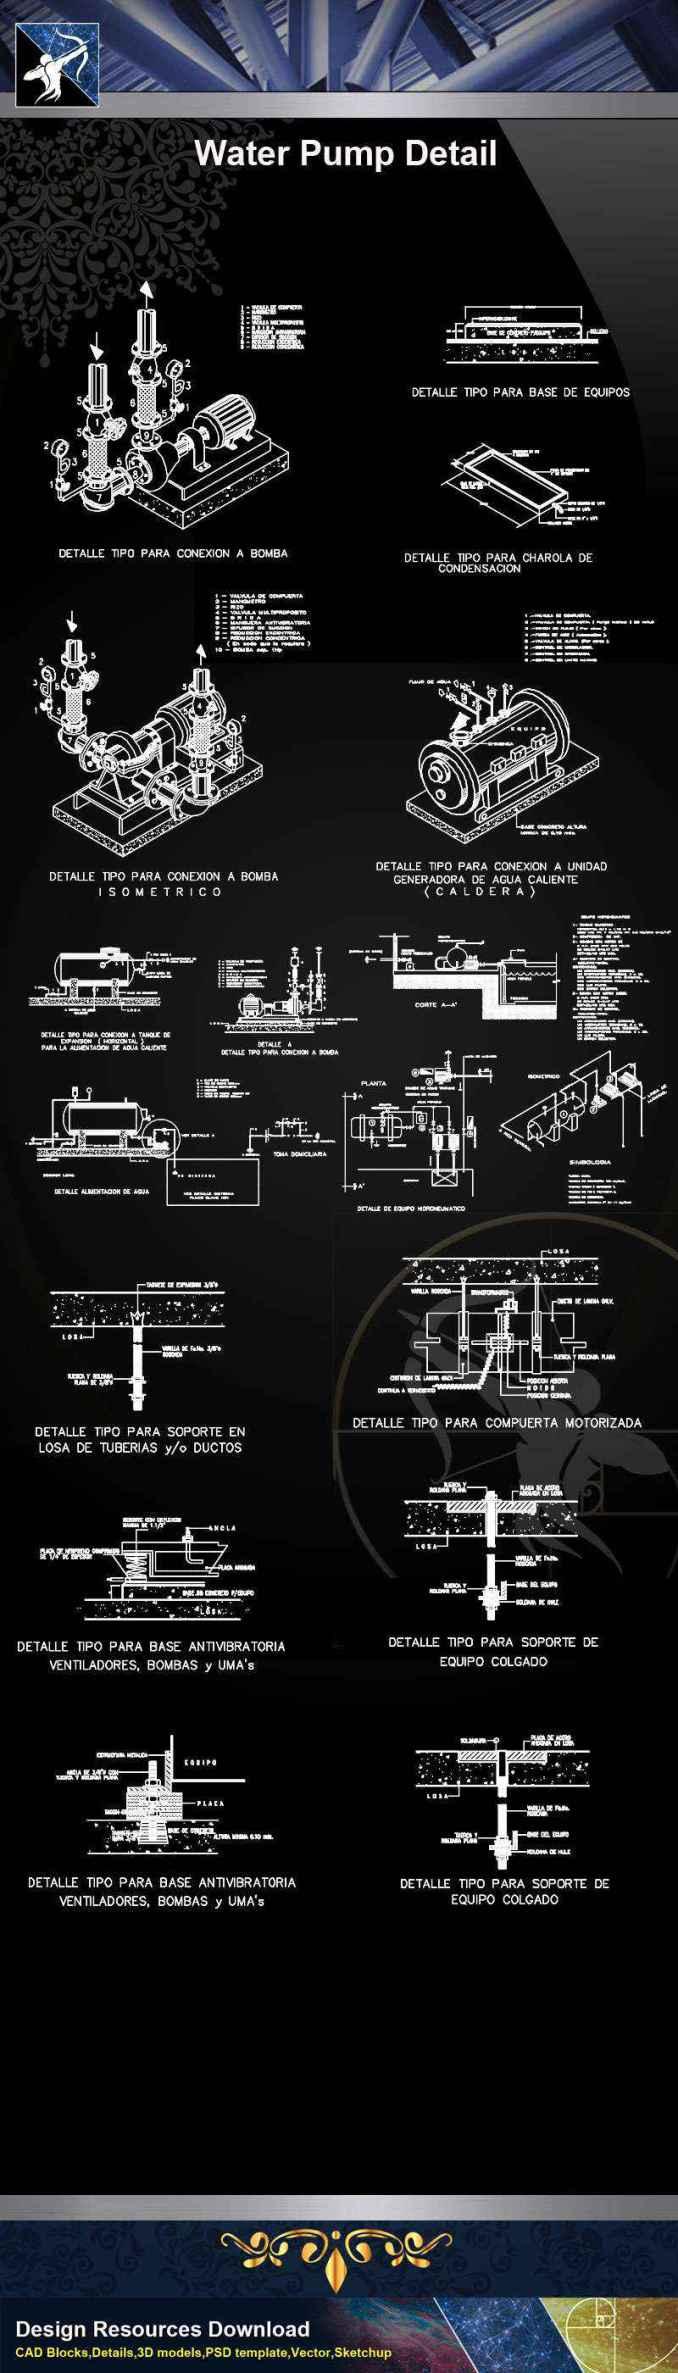 【Architecture CAD Details Collections】Water Pump CAD Details